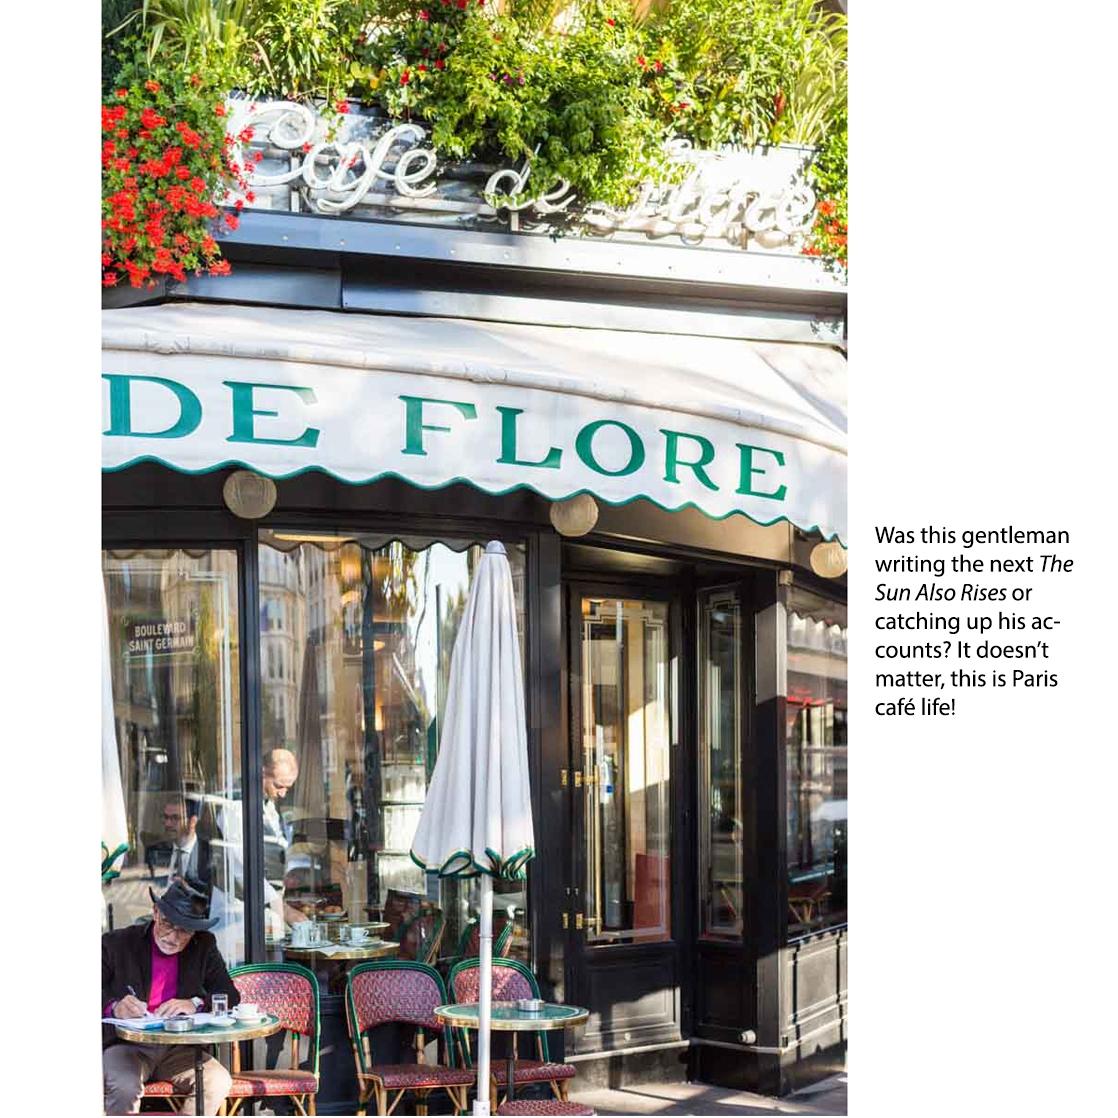 CafedeFlorewriter.jpg